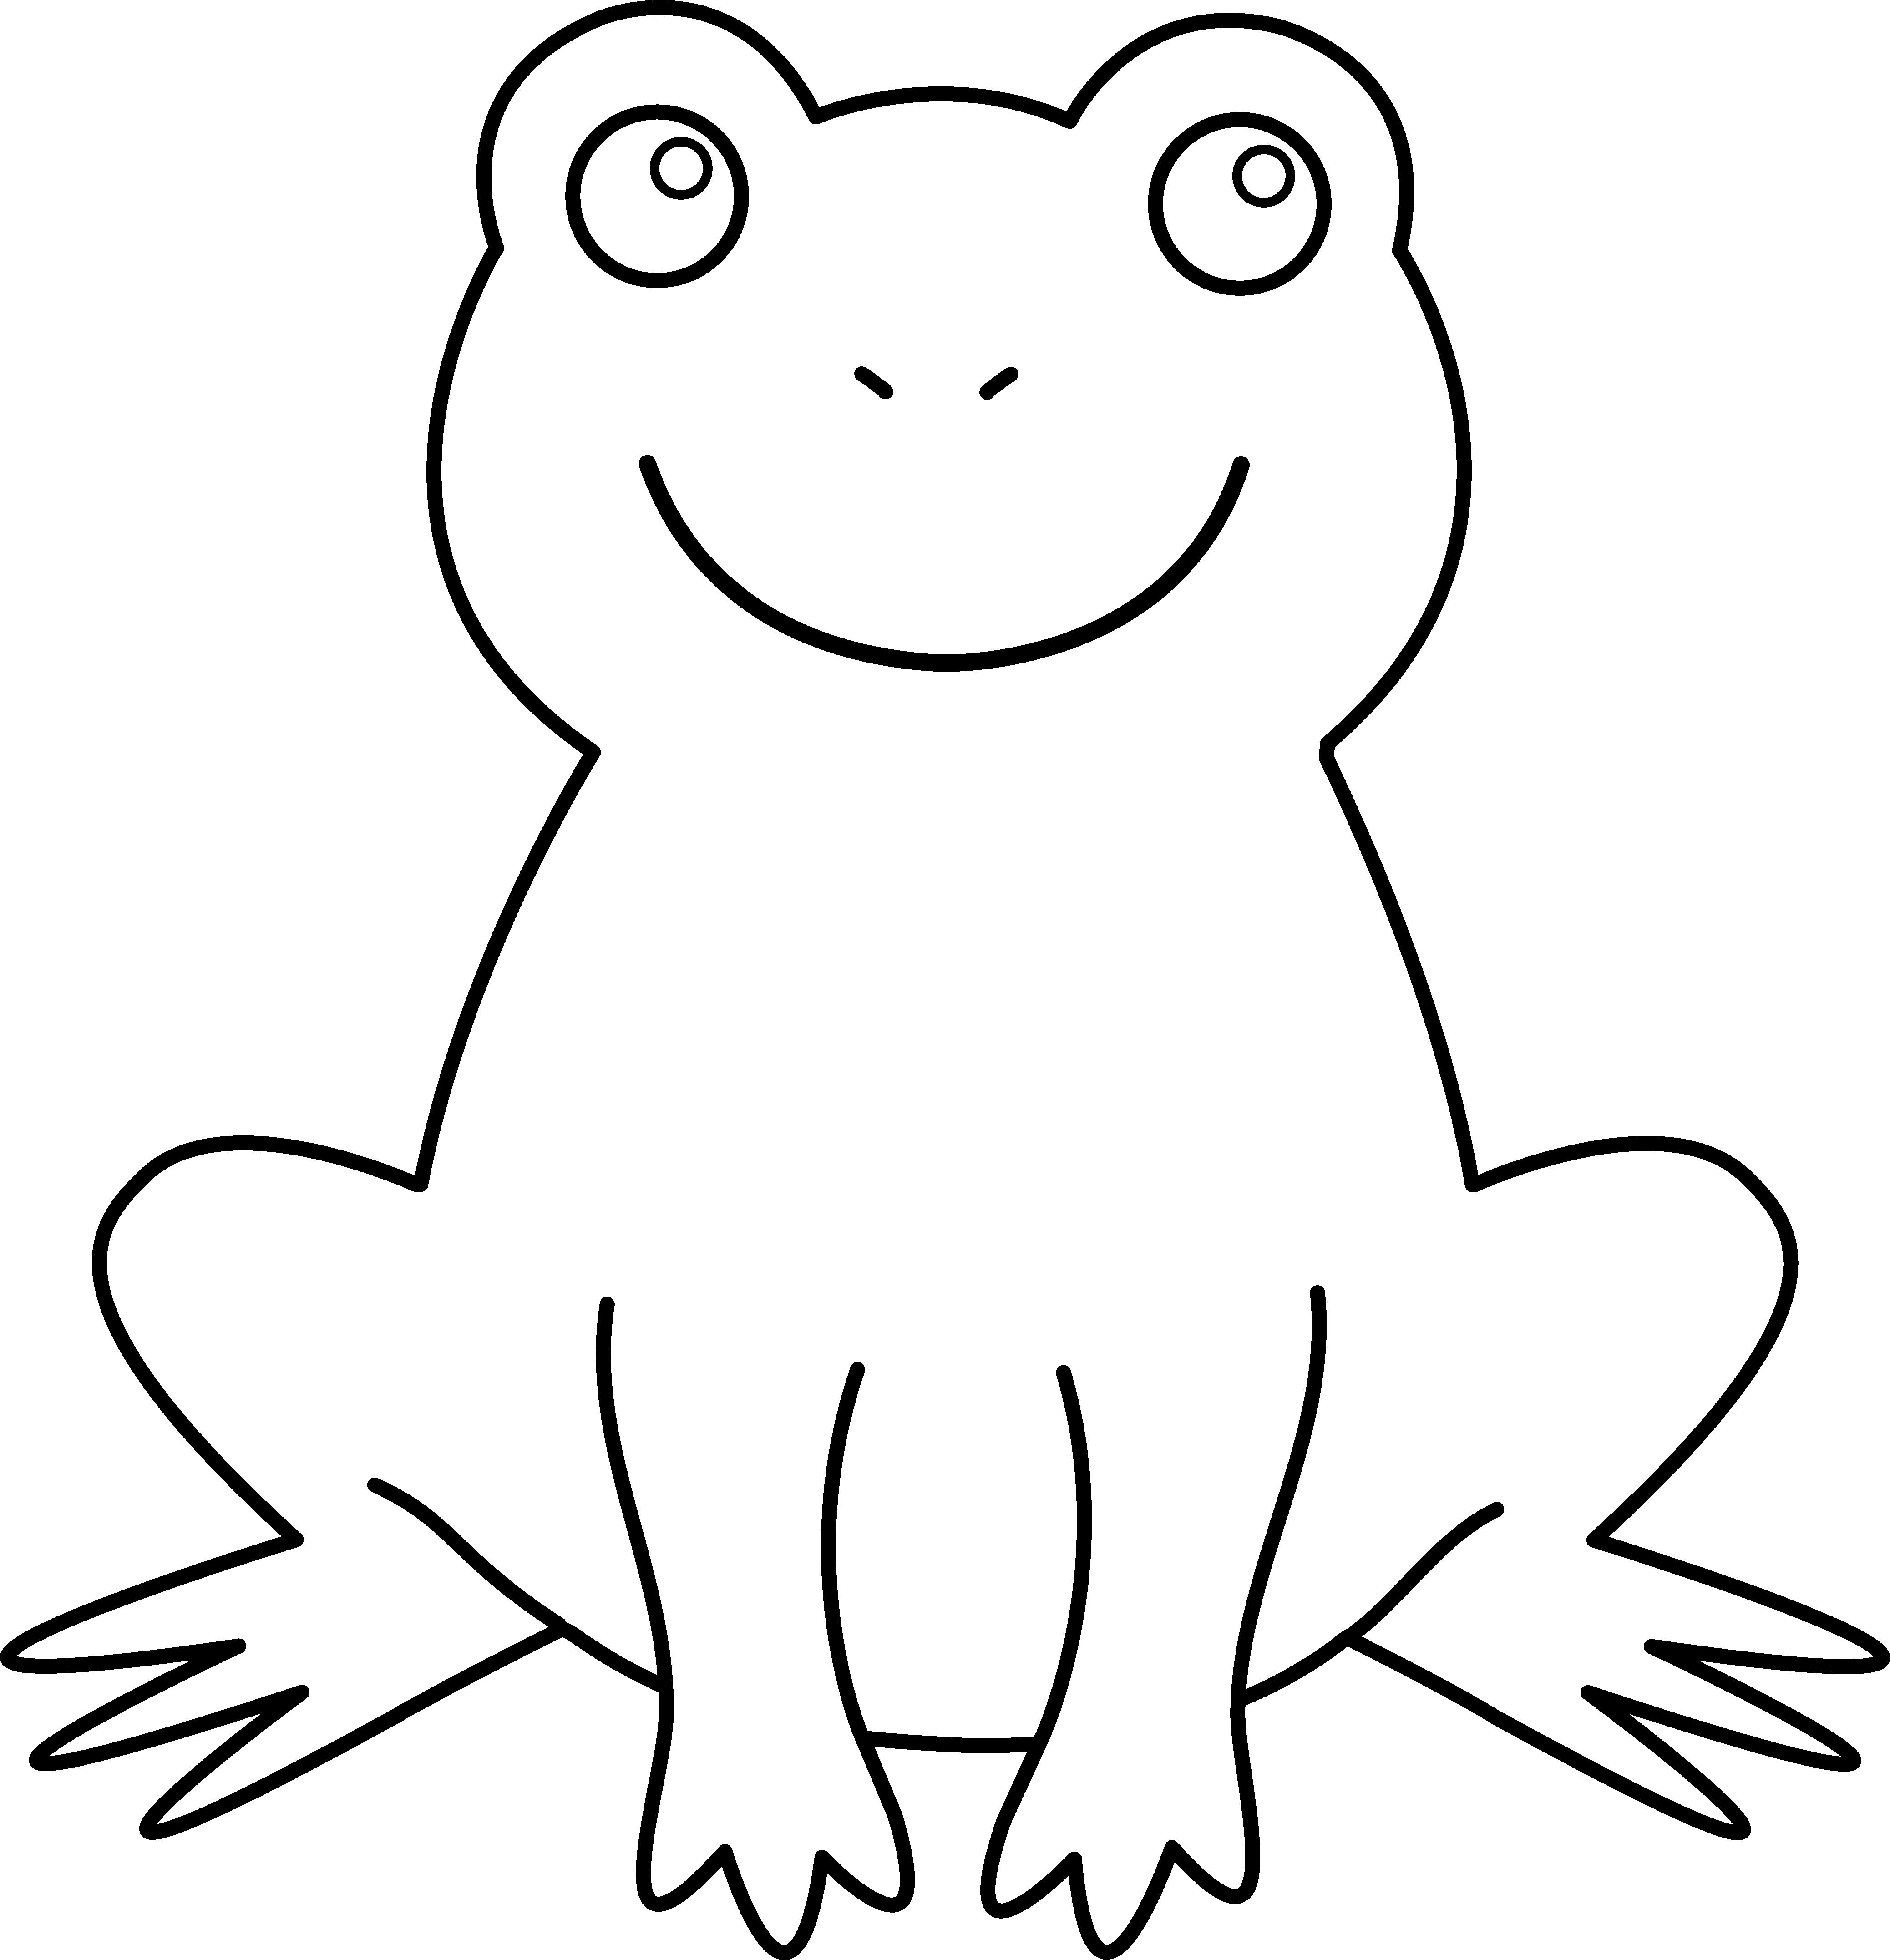 Black and White Frog - Black And White Frog PNG